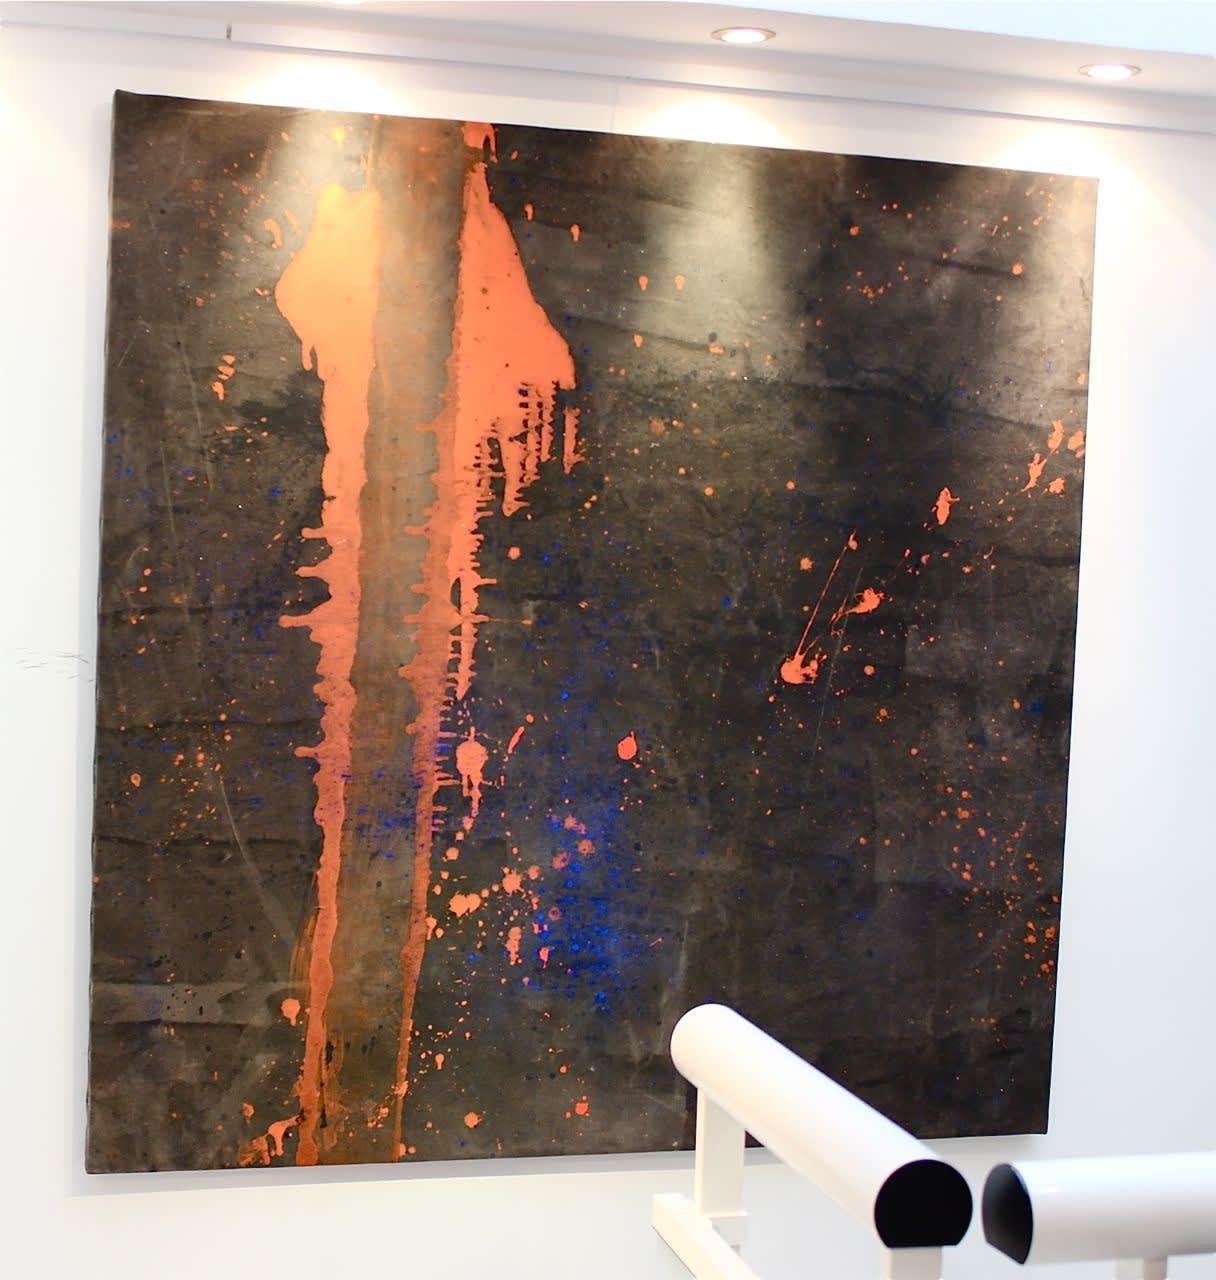 Cadmium Black VIII , 2013 Installation view